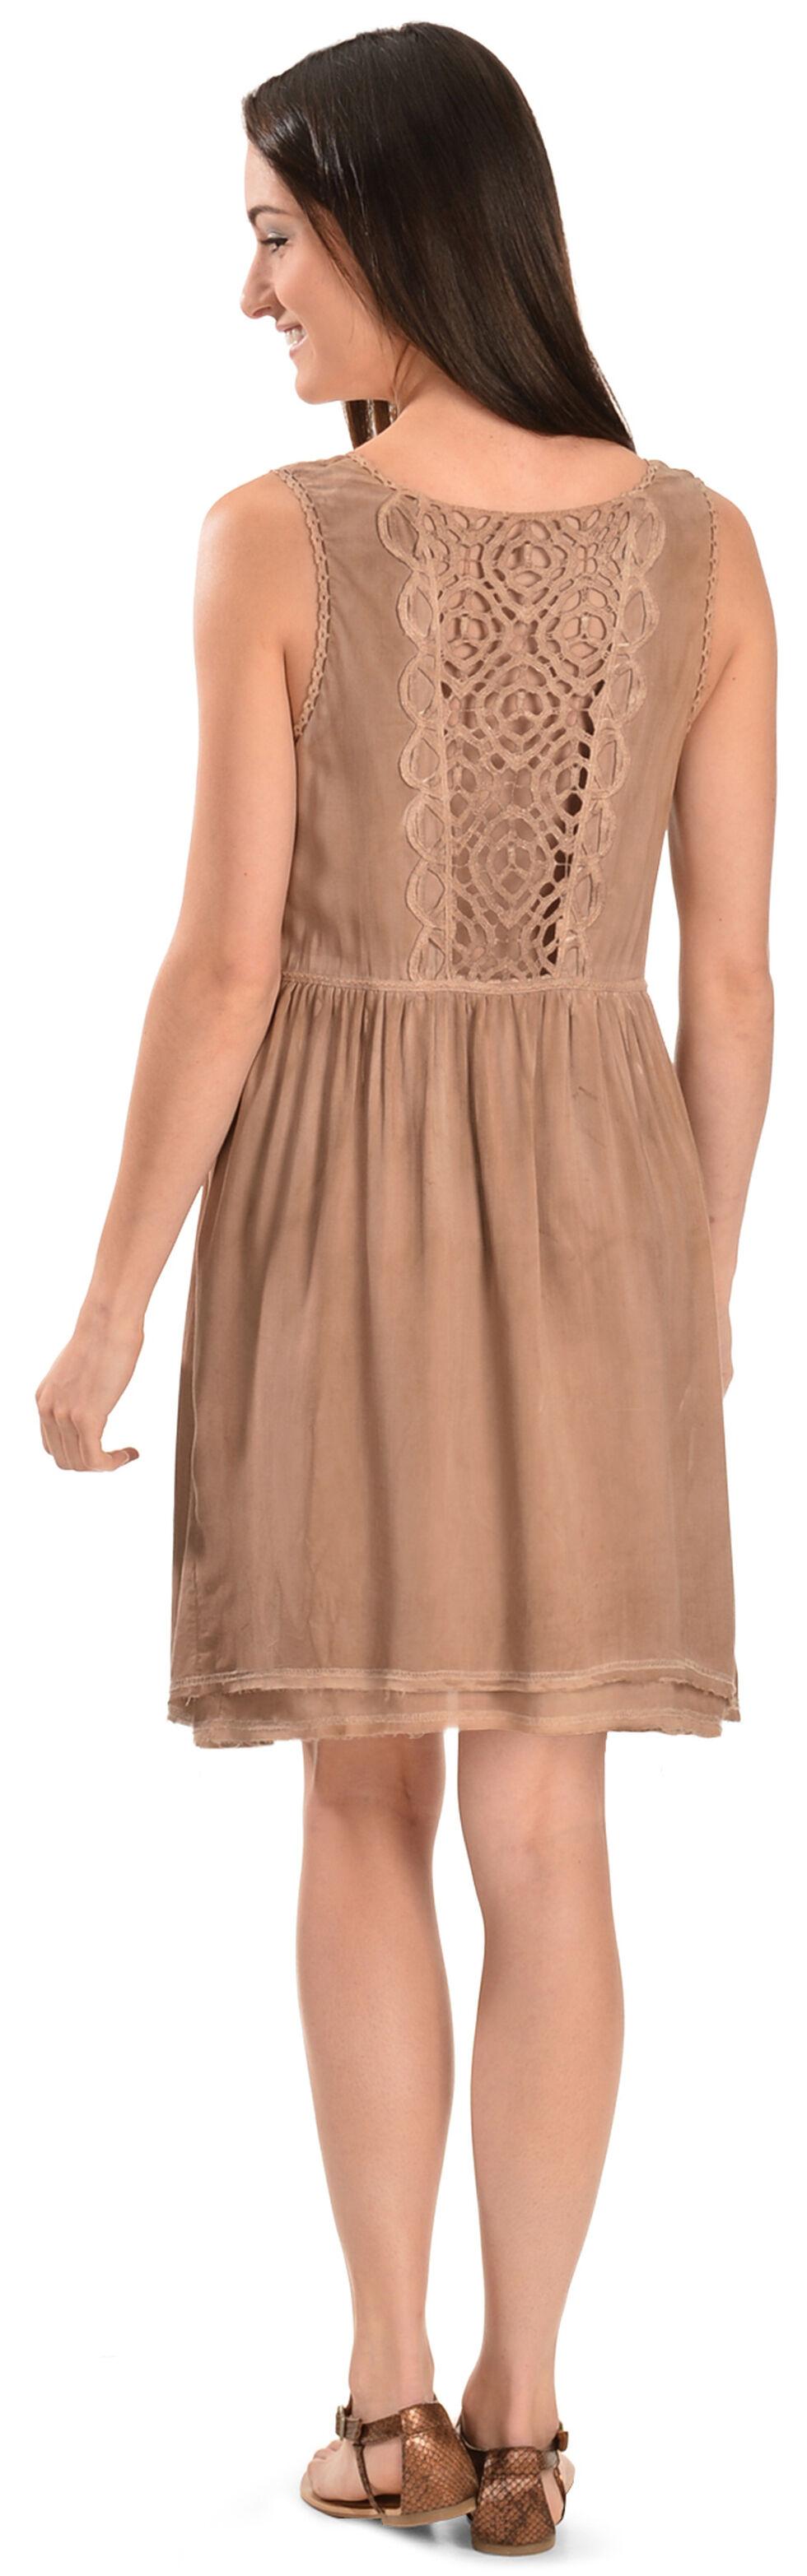 Black Swan Victoria Dress, Taupe, hi-res